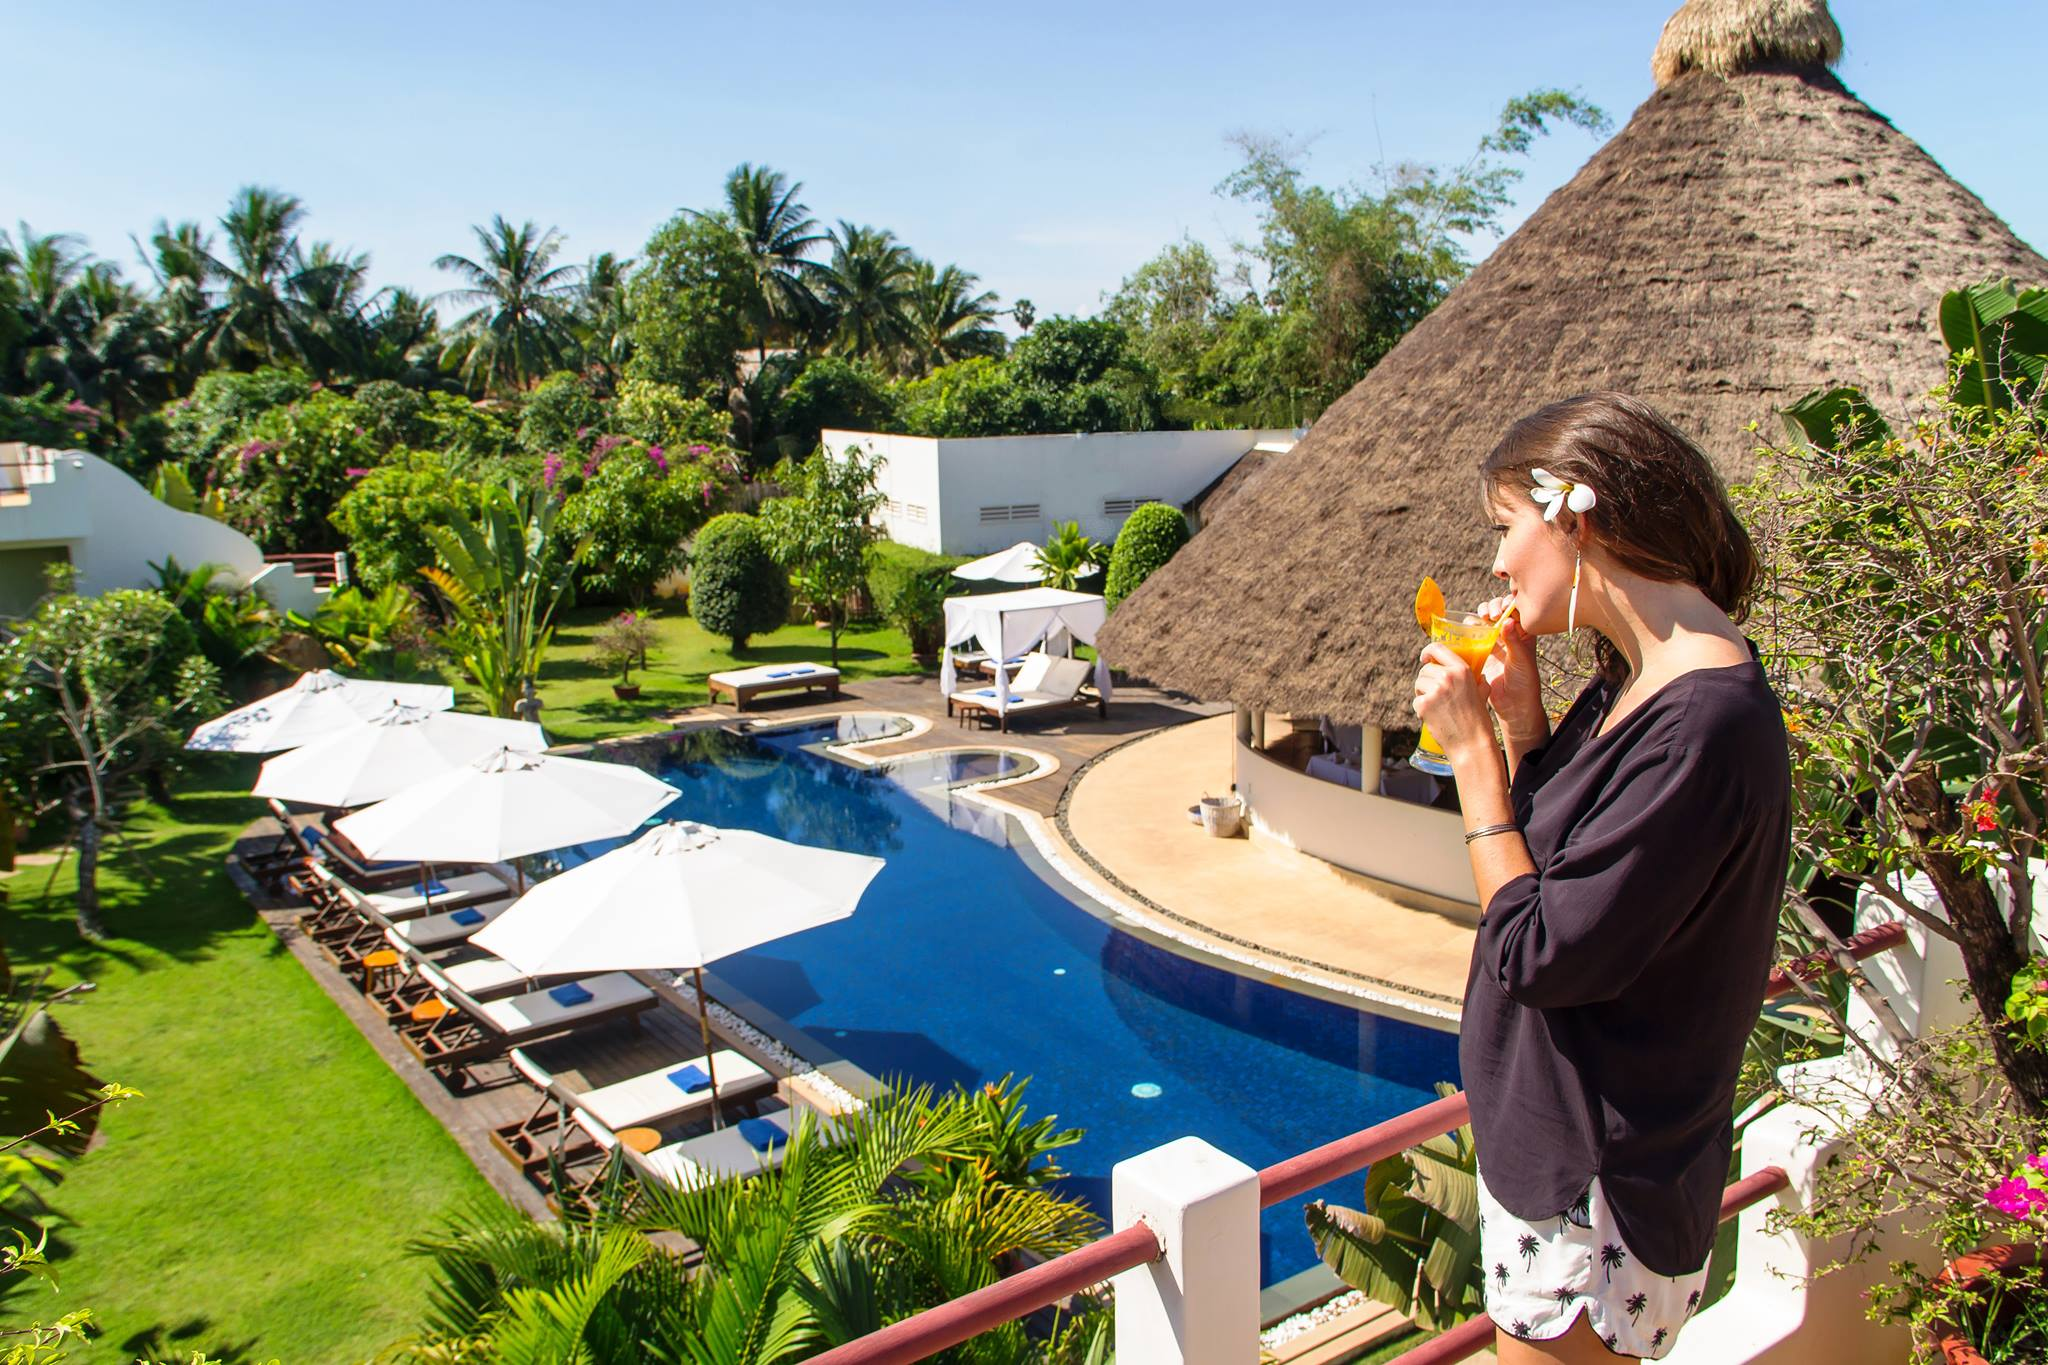 navutu-dreams-resort-and-wellness-retreat-center-krong-siem-reap-cambodia-5